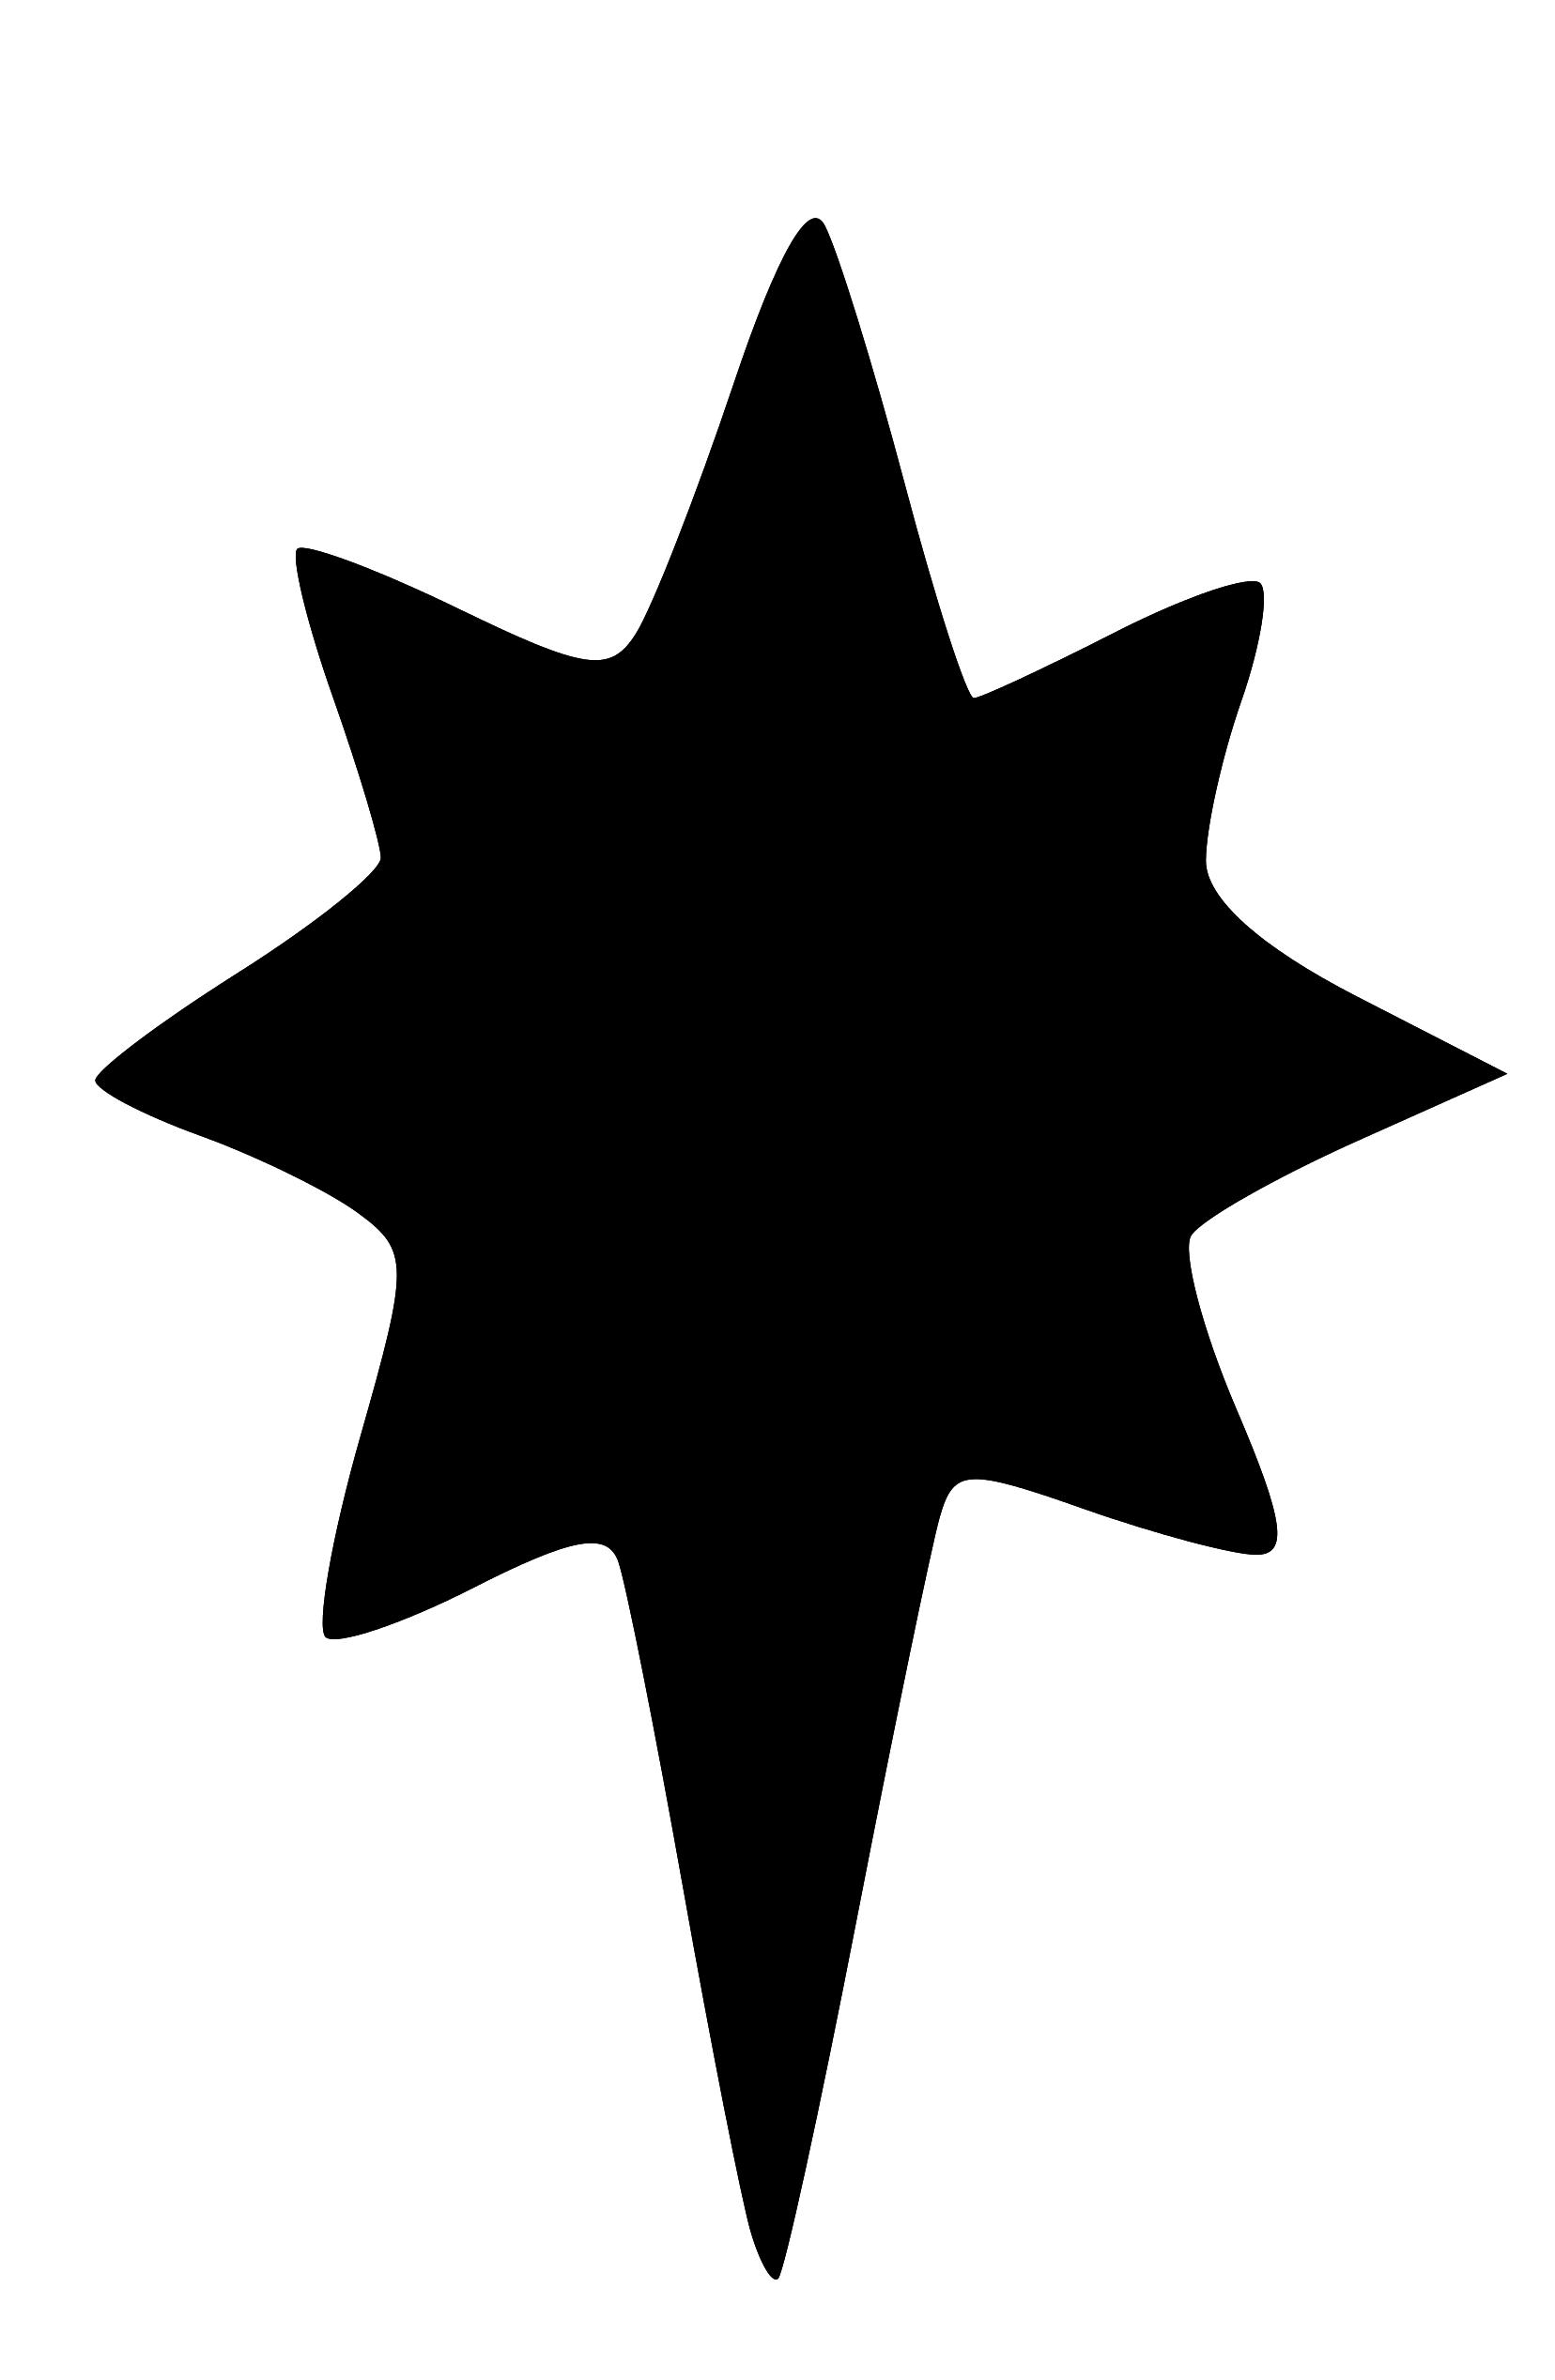 1656x2535 Black Star Clipart Craft Projects Symbols Clipart